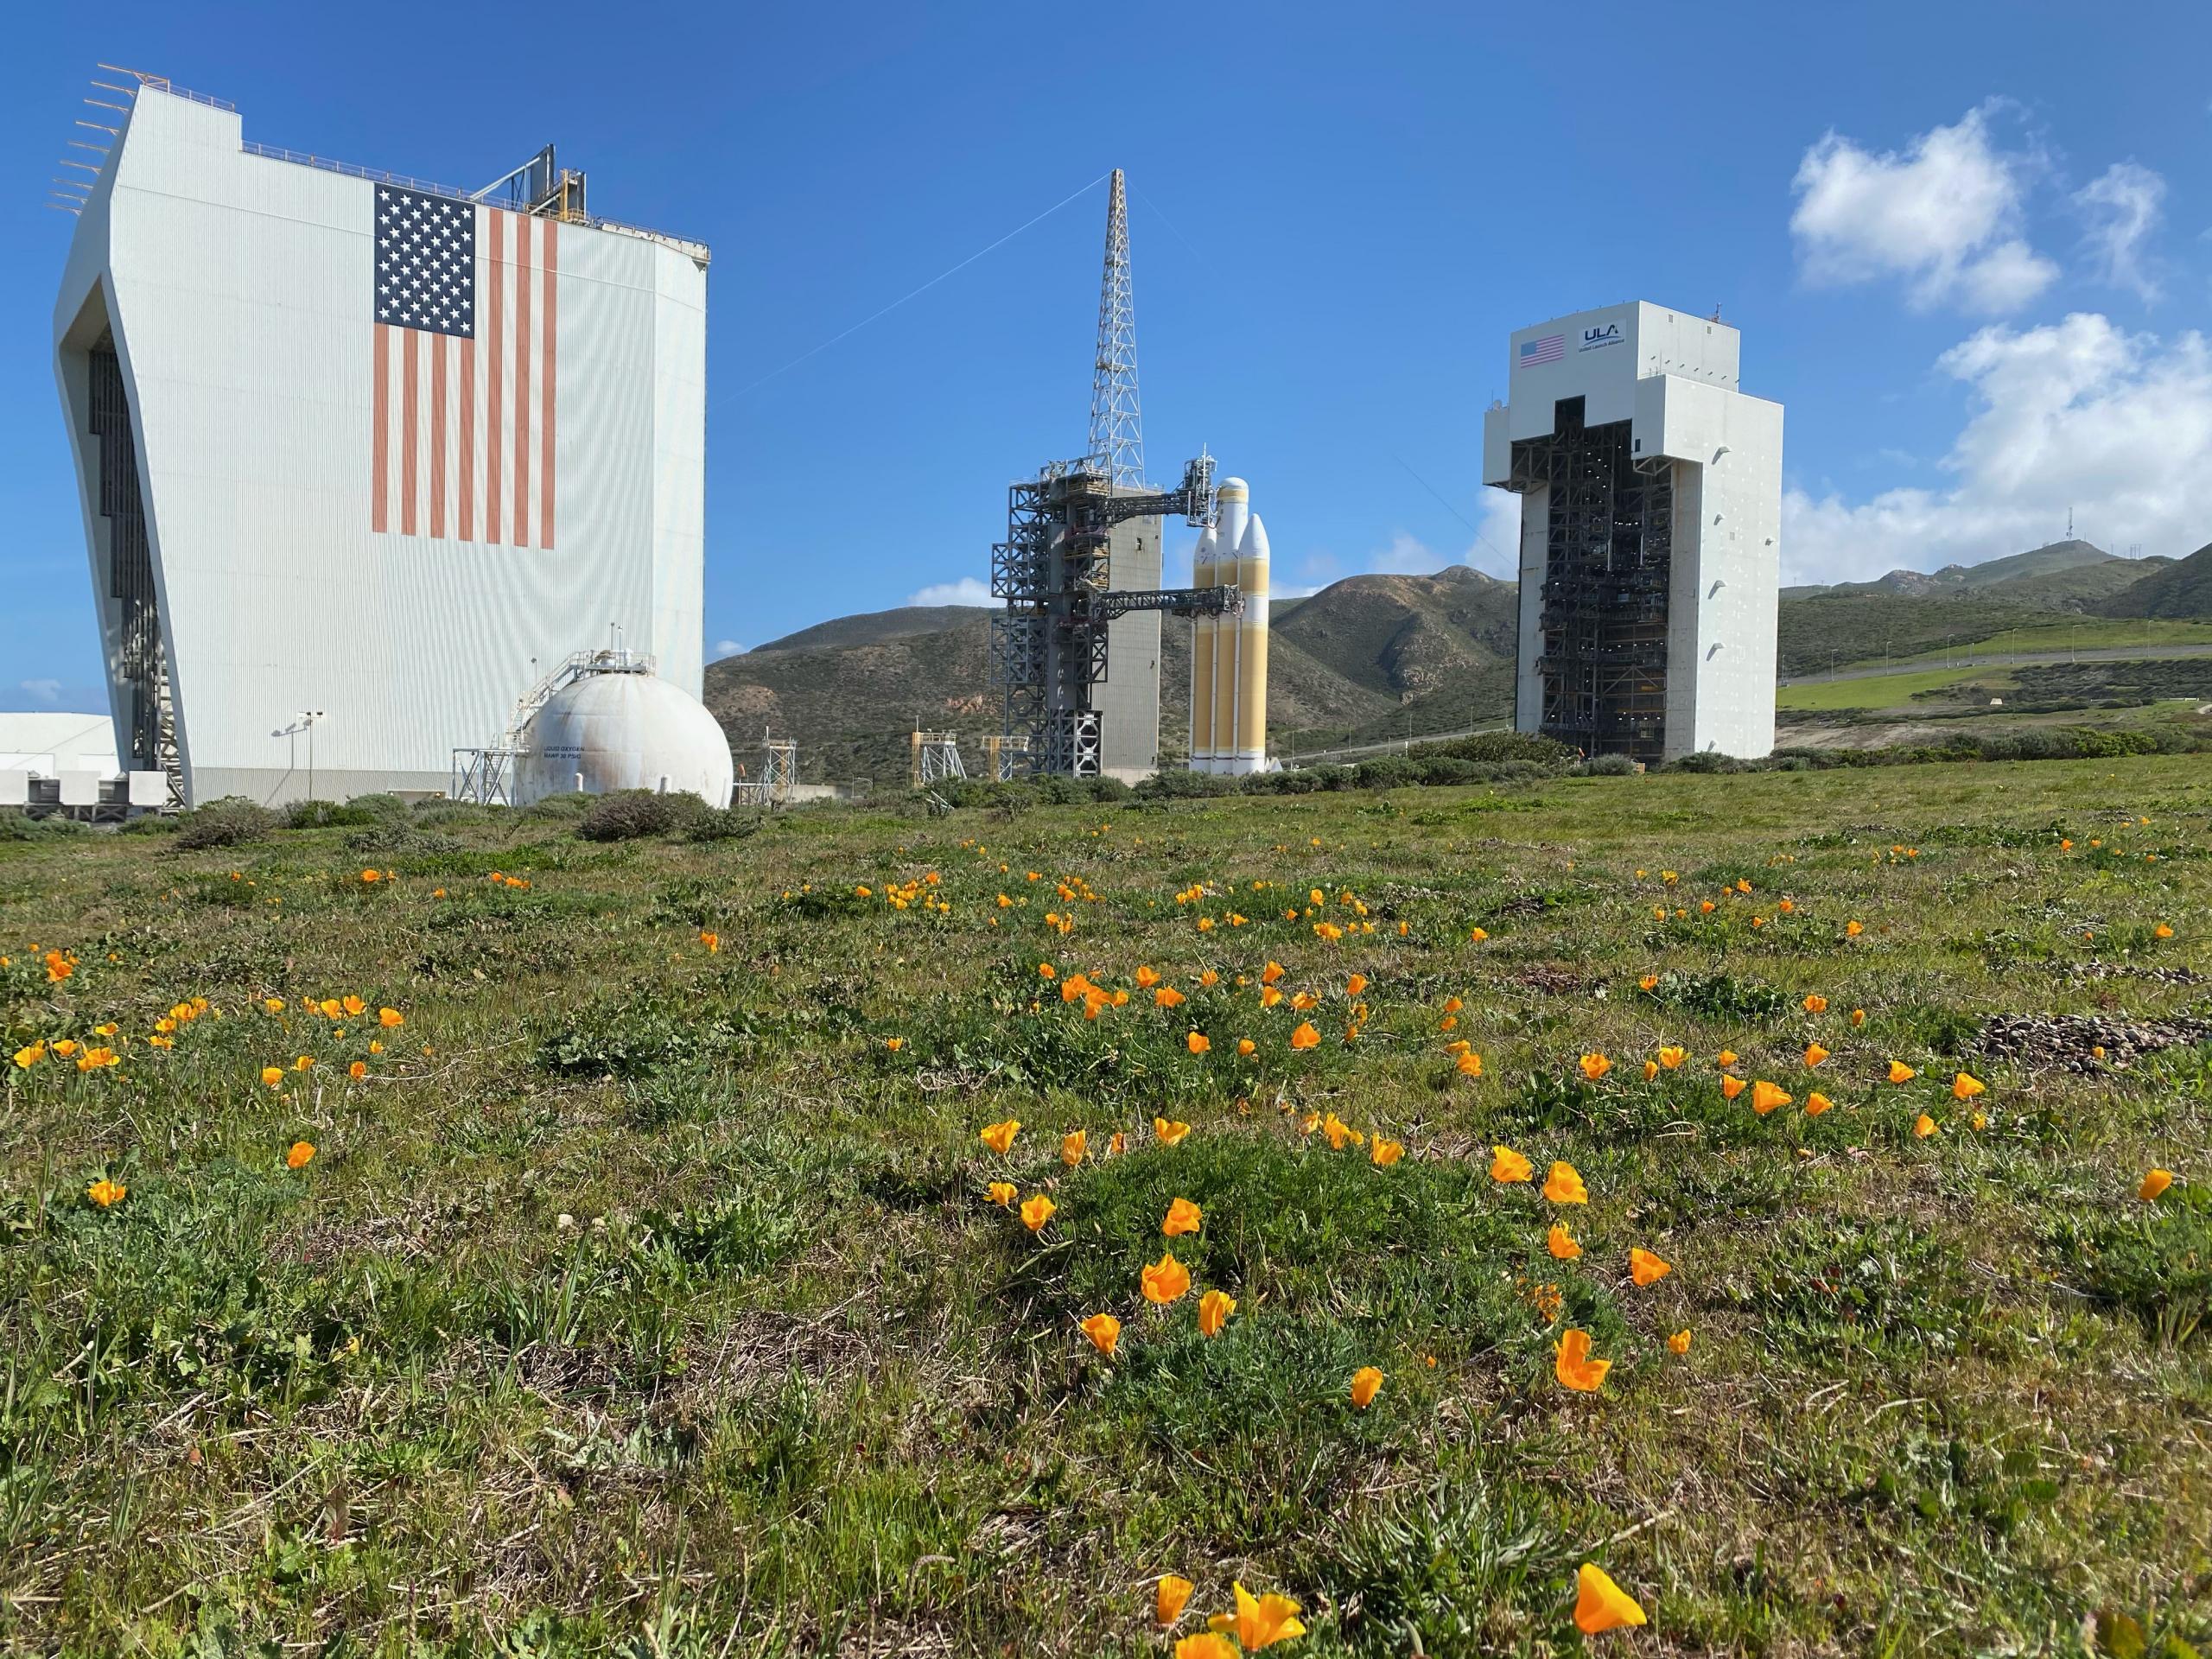 ULA completes Delta IV Heavy pad upgrades ahead of NROL-82 mission